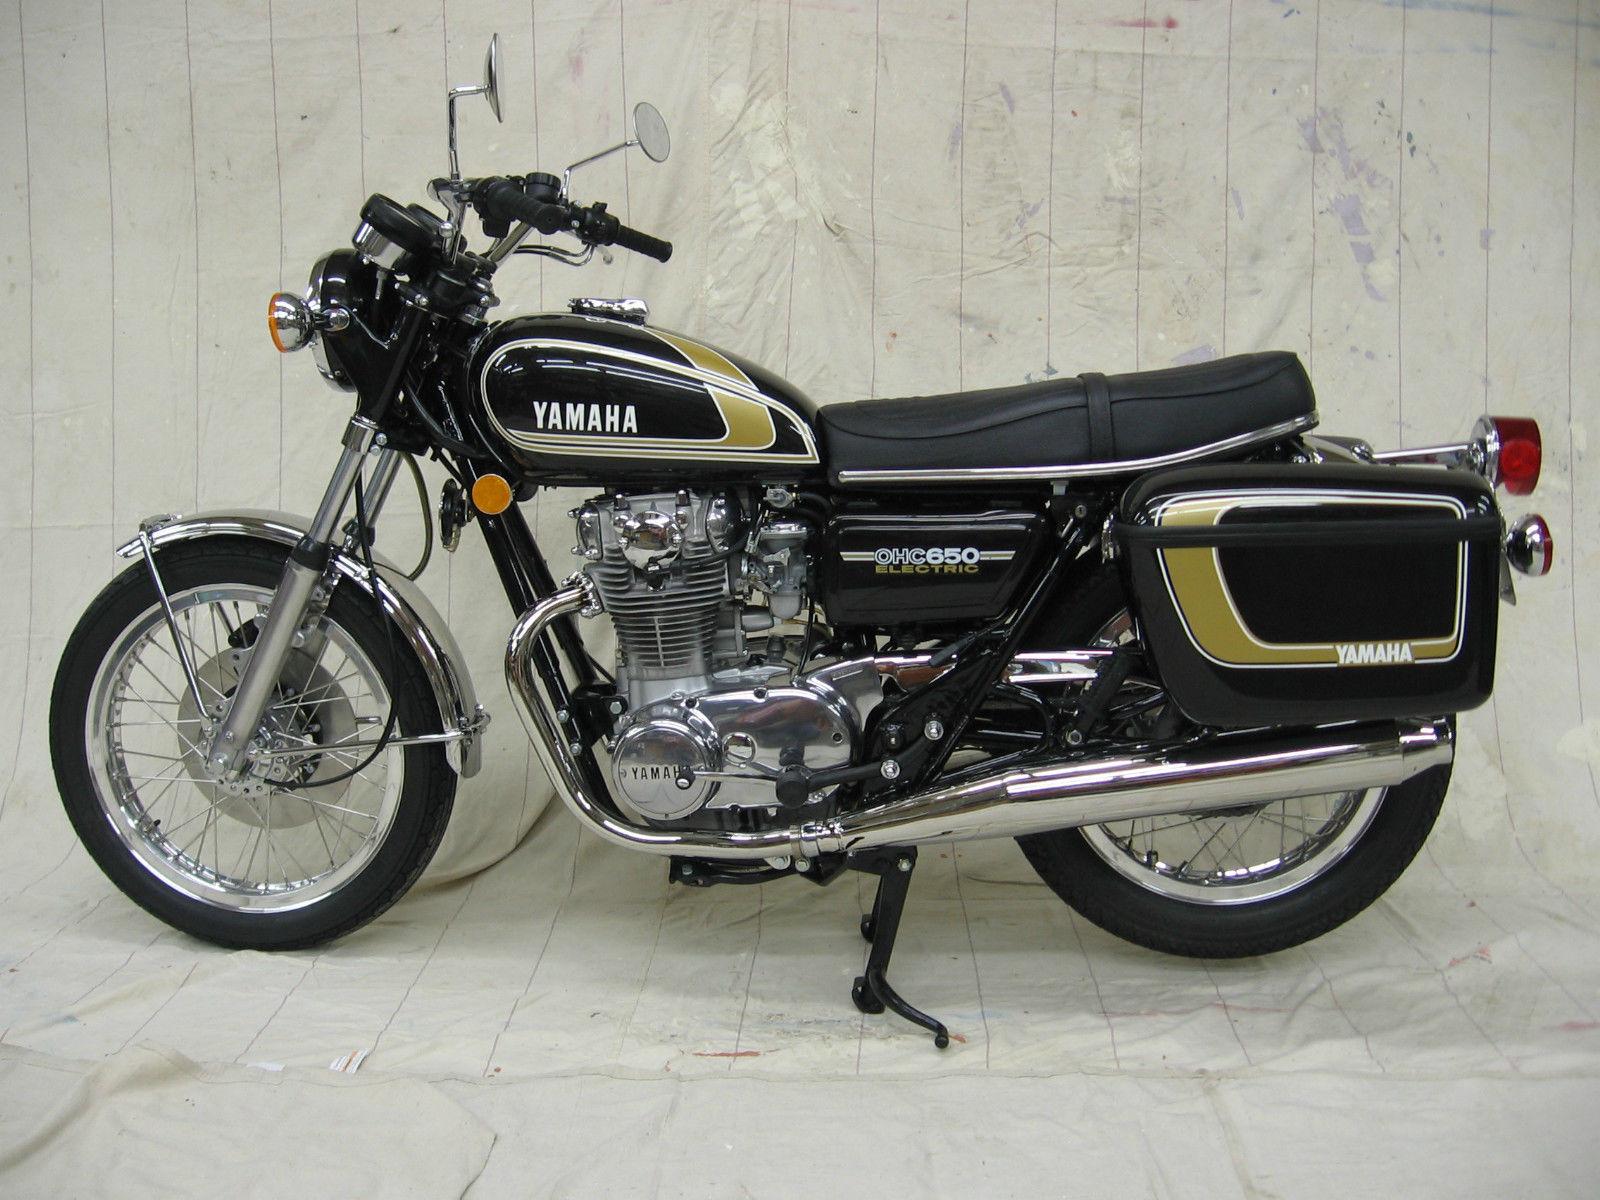 Yamaha XS650 - 1975 - Left Side View, Headlight, Flashers, Wheels, Brakes